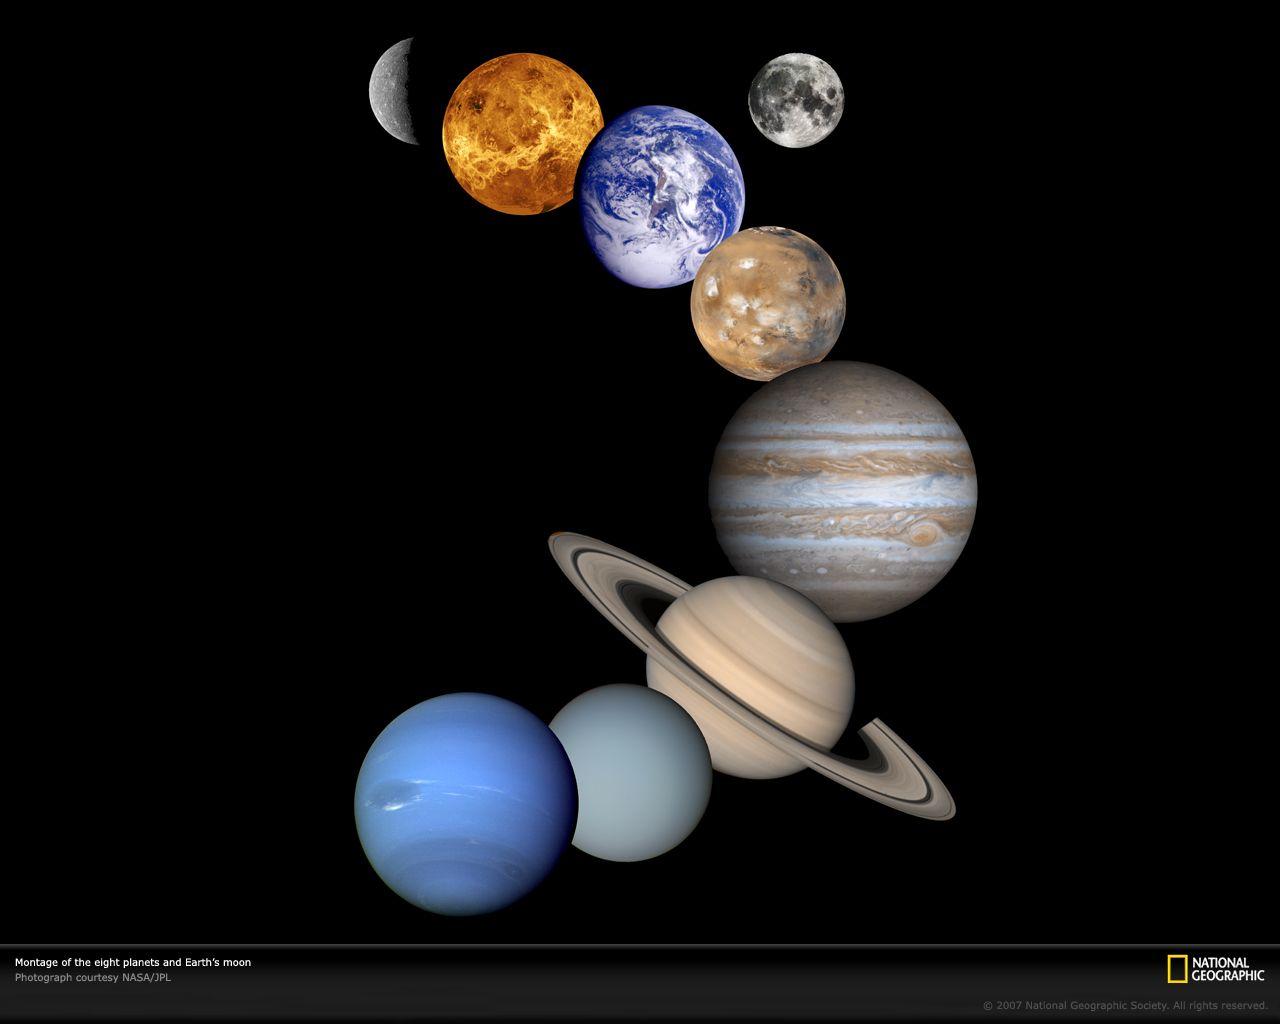 Planetary Lineup Pia Xl Jpg 1280 1024 天文学 太陽系 惑星